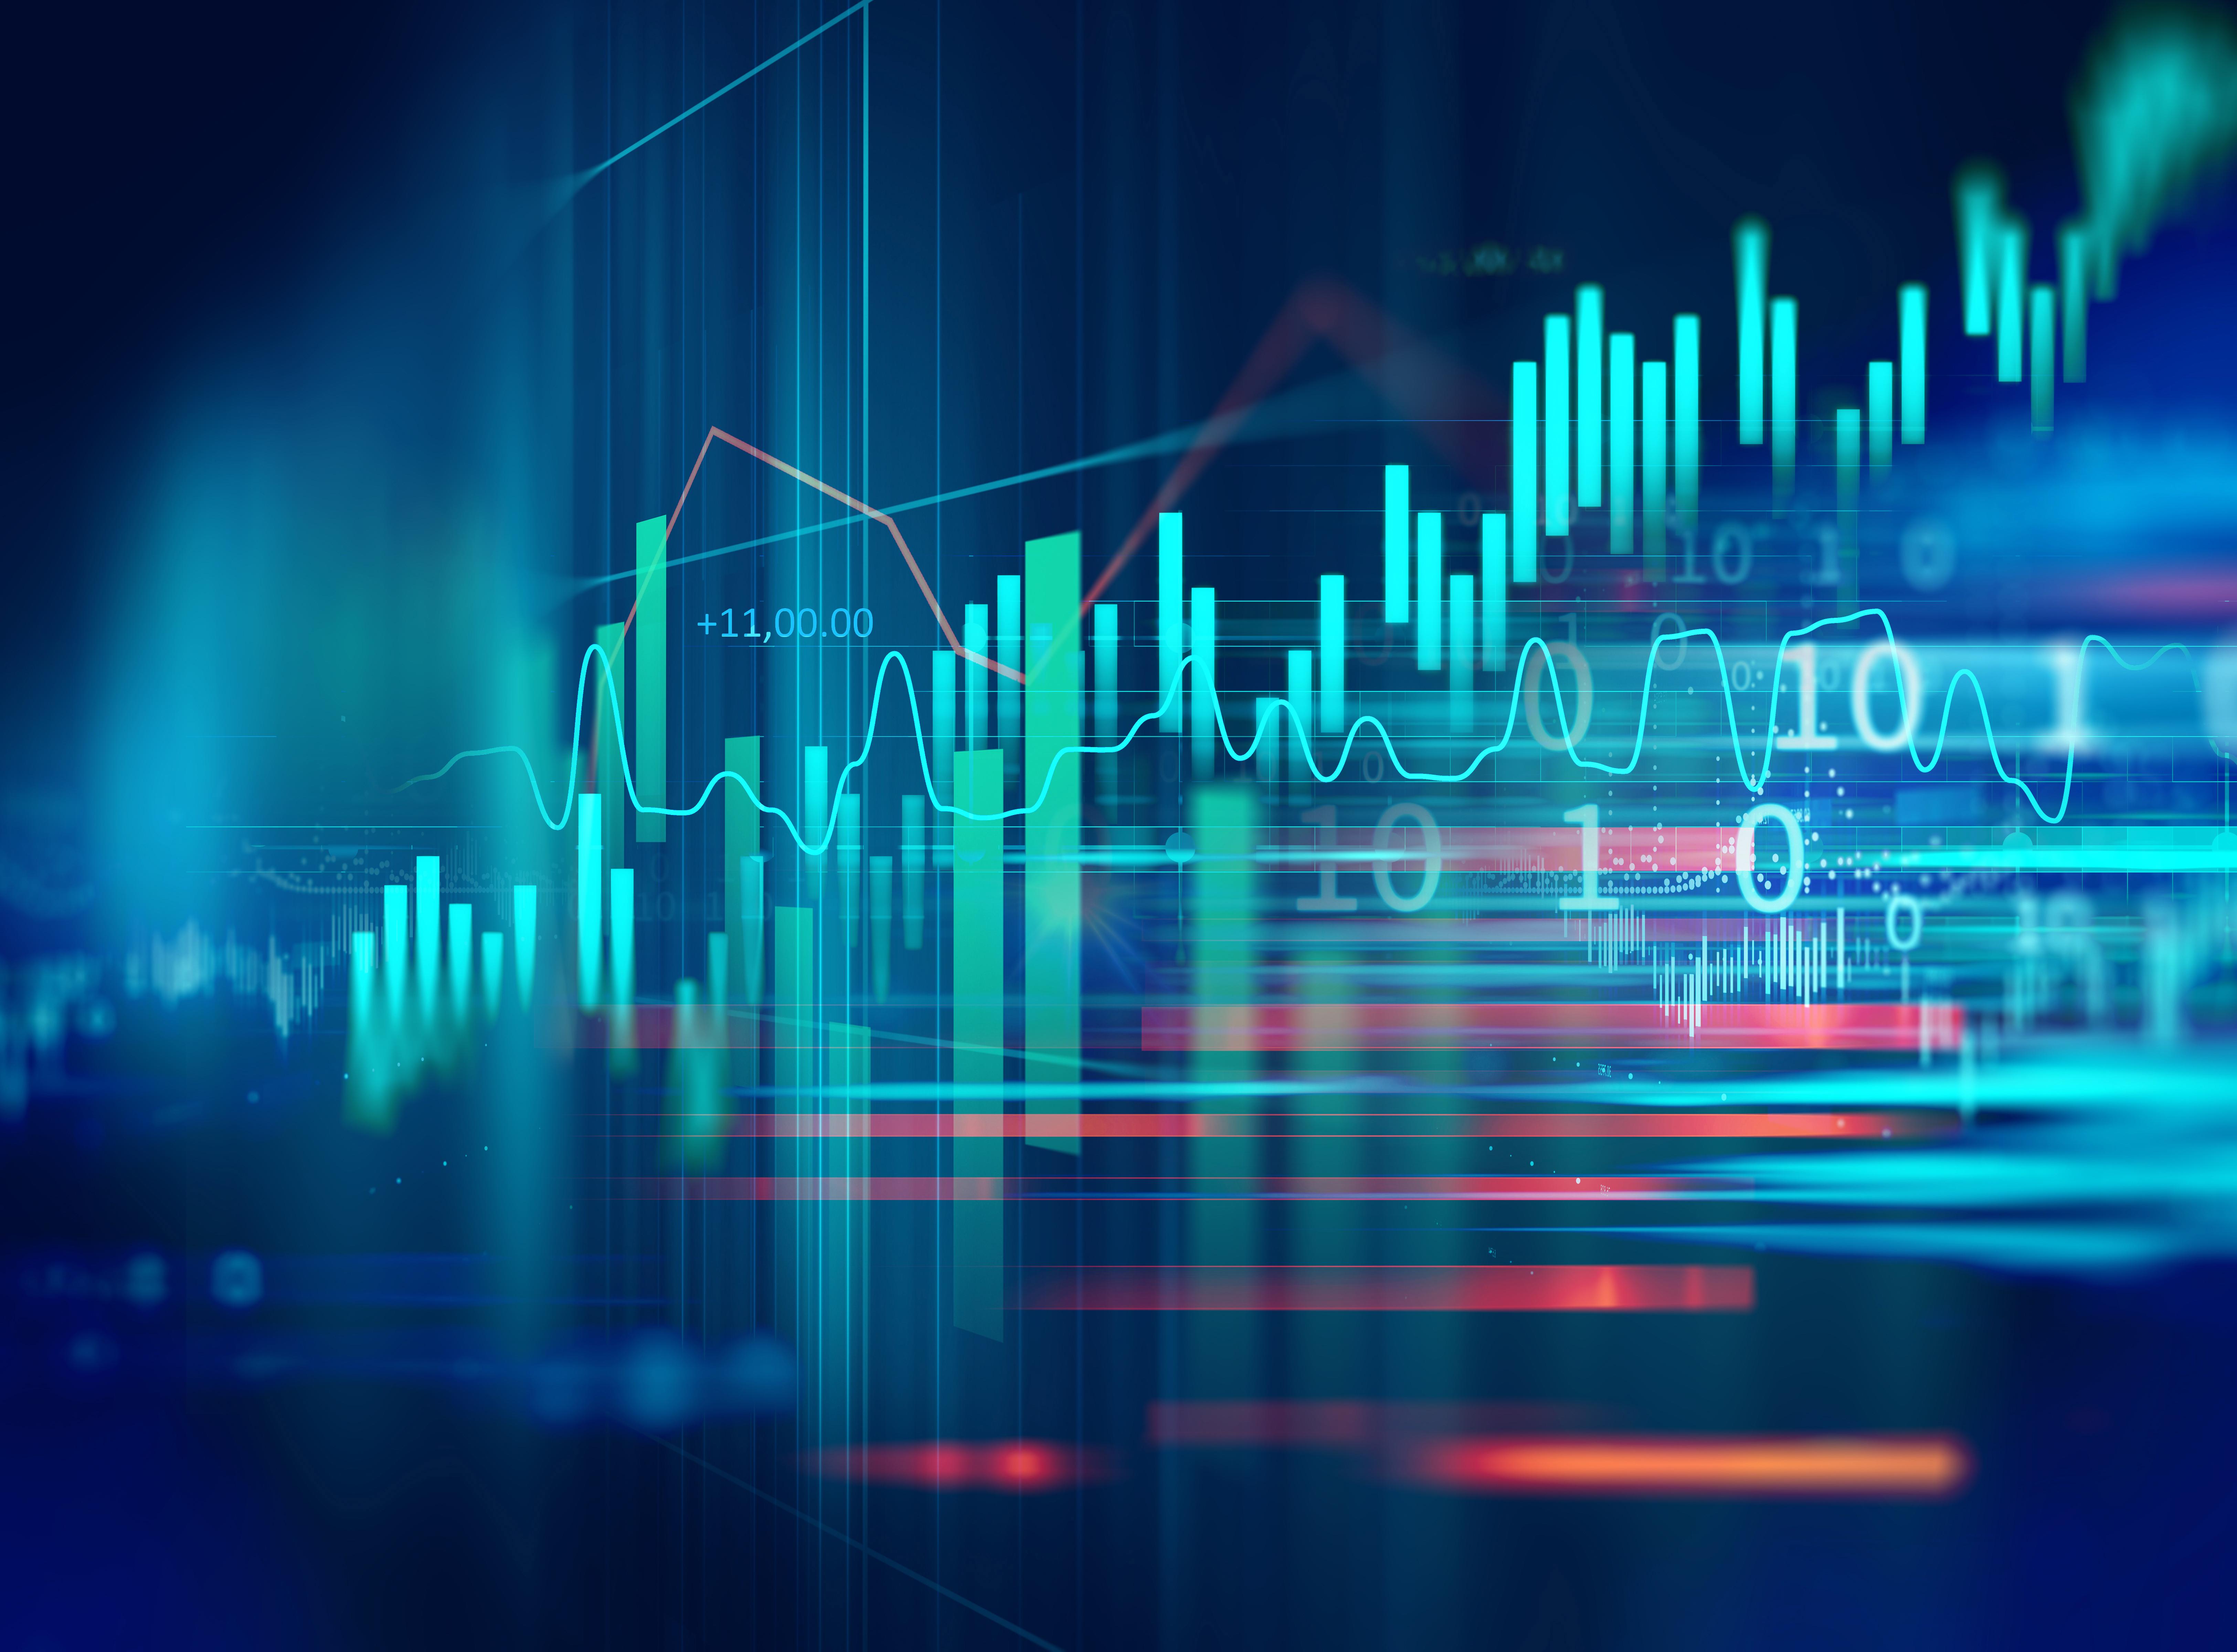 Data mining: cos'è e a cosa serve